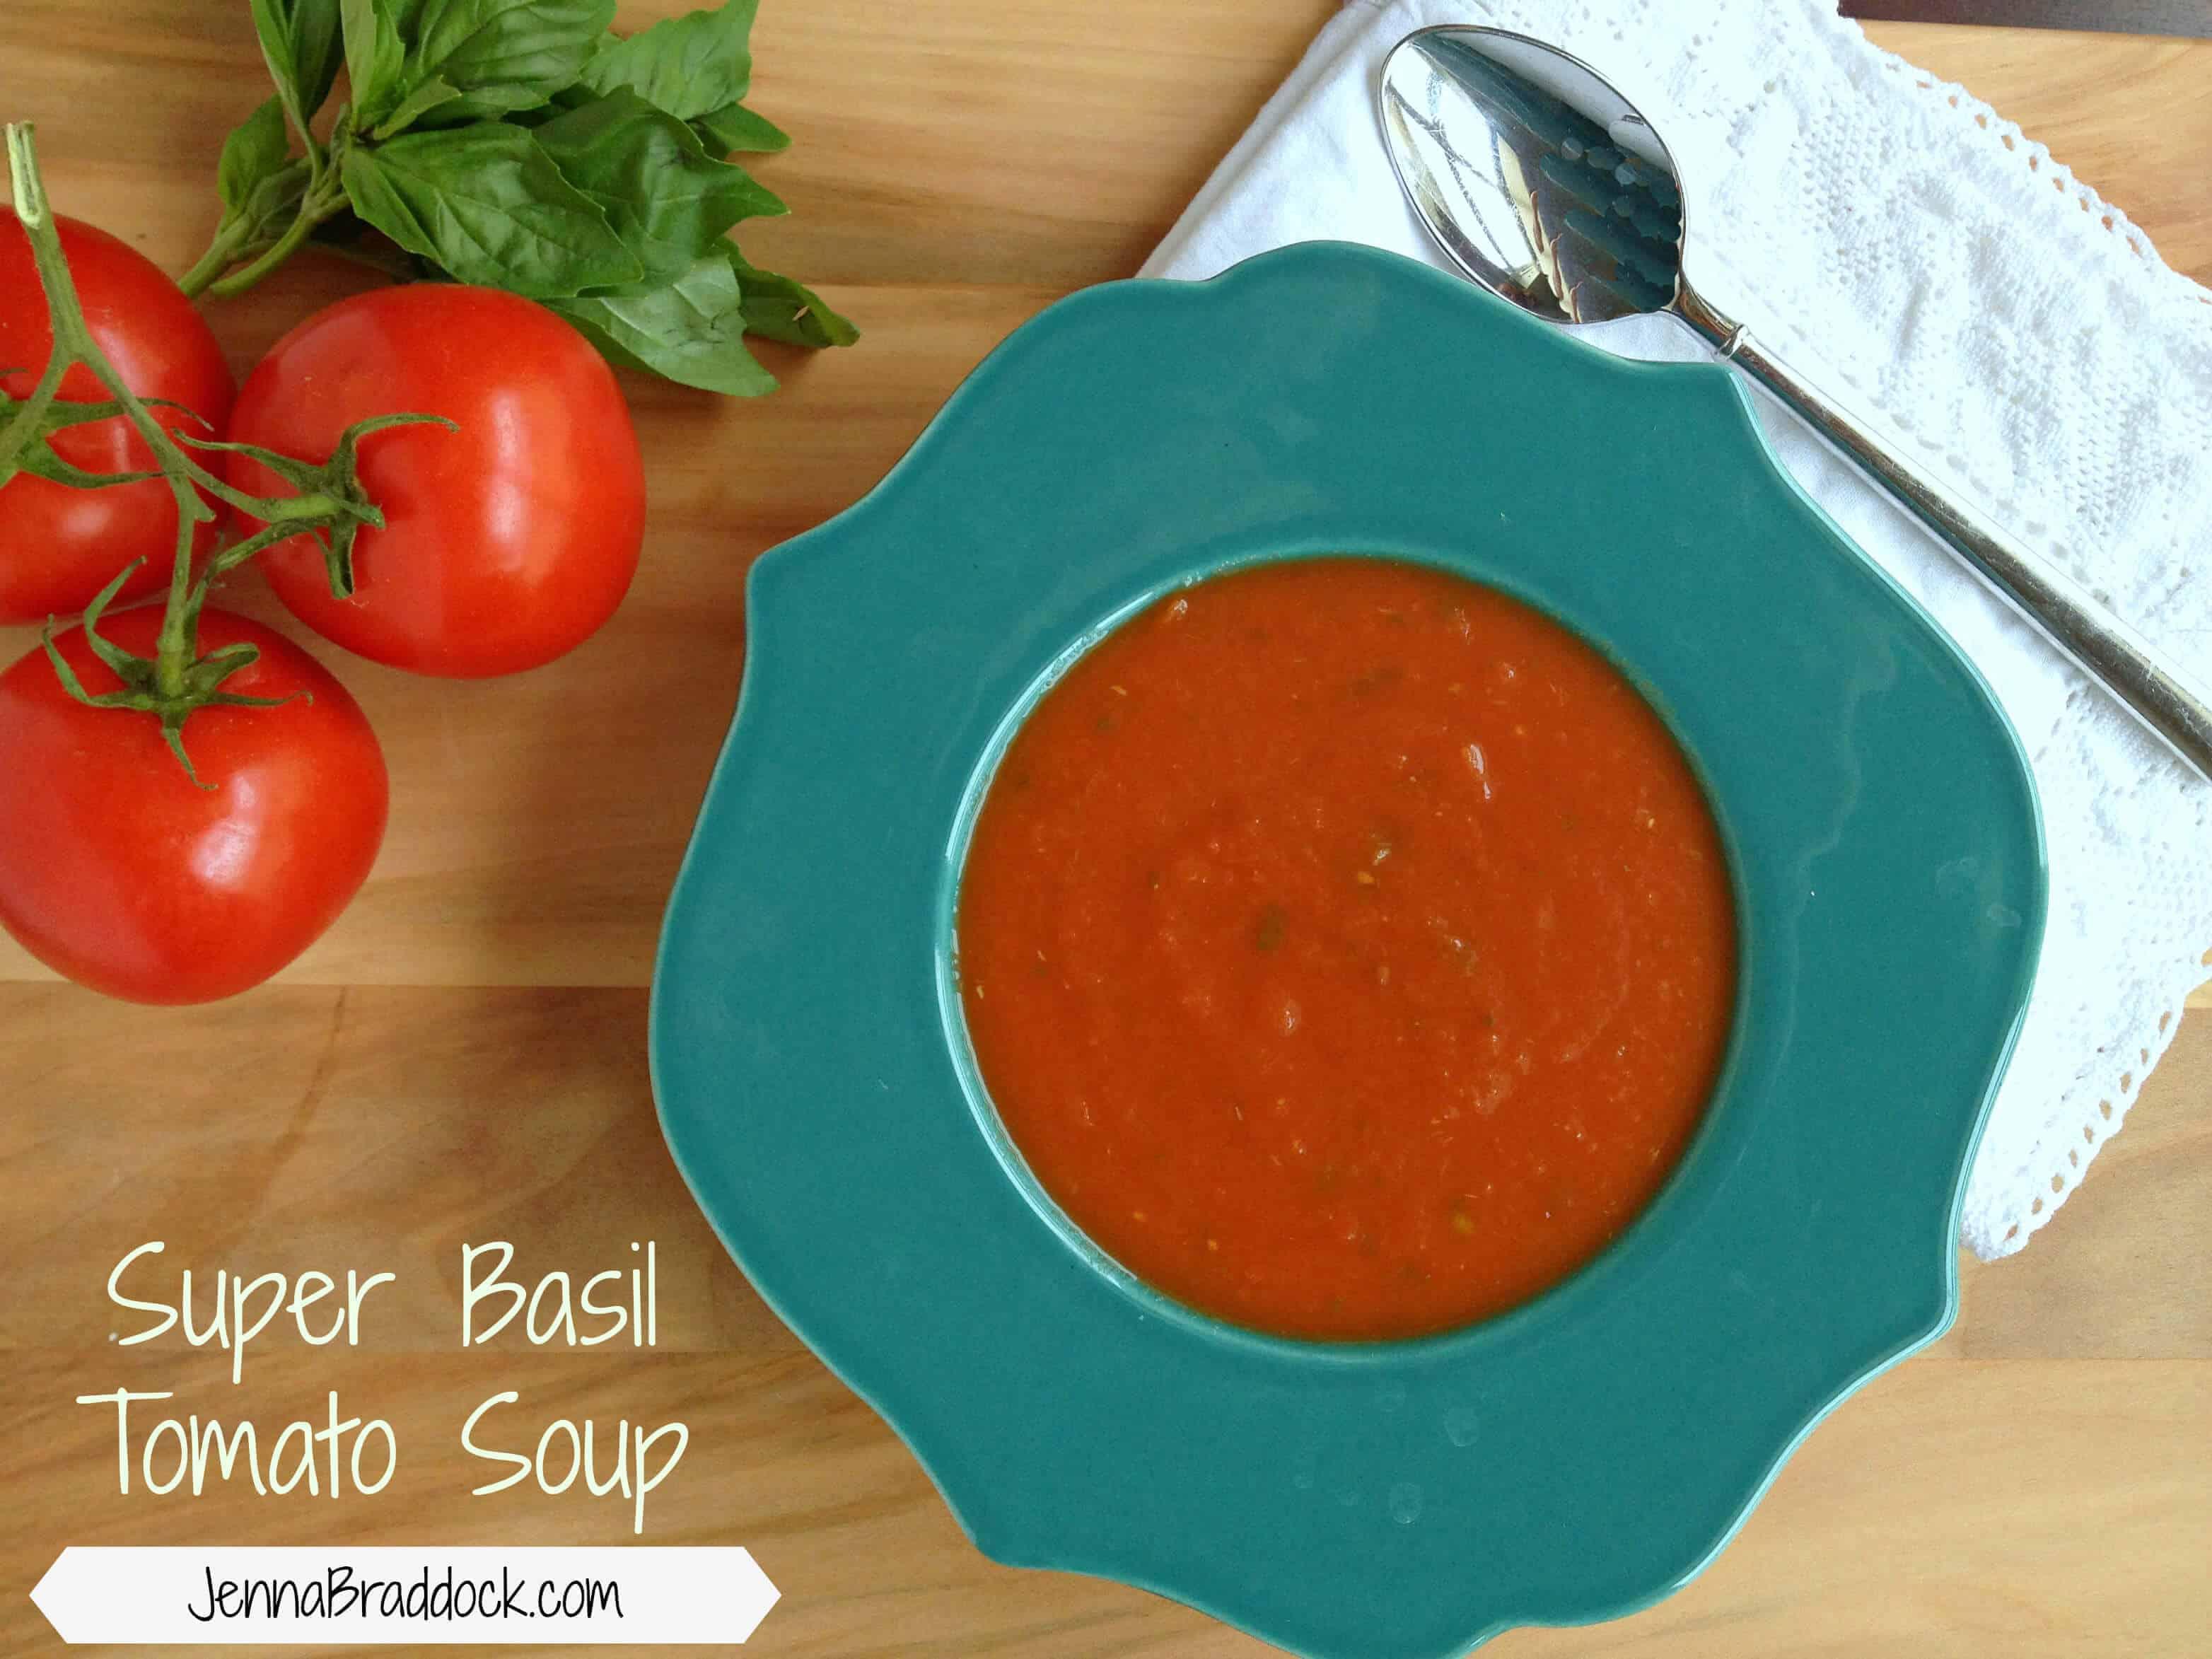 Super Basil Tomato Soup